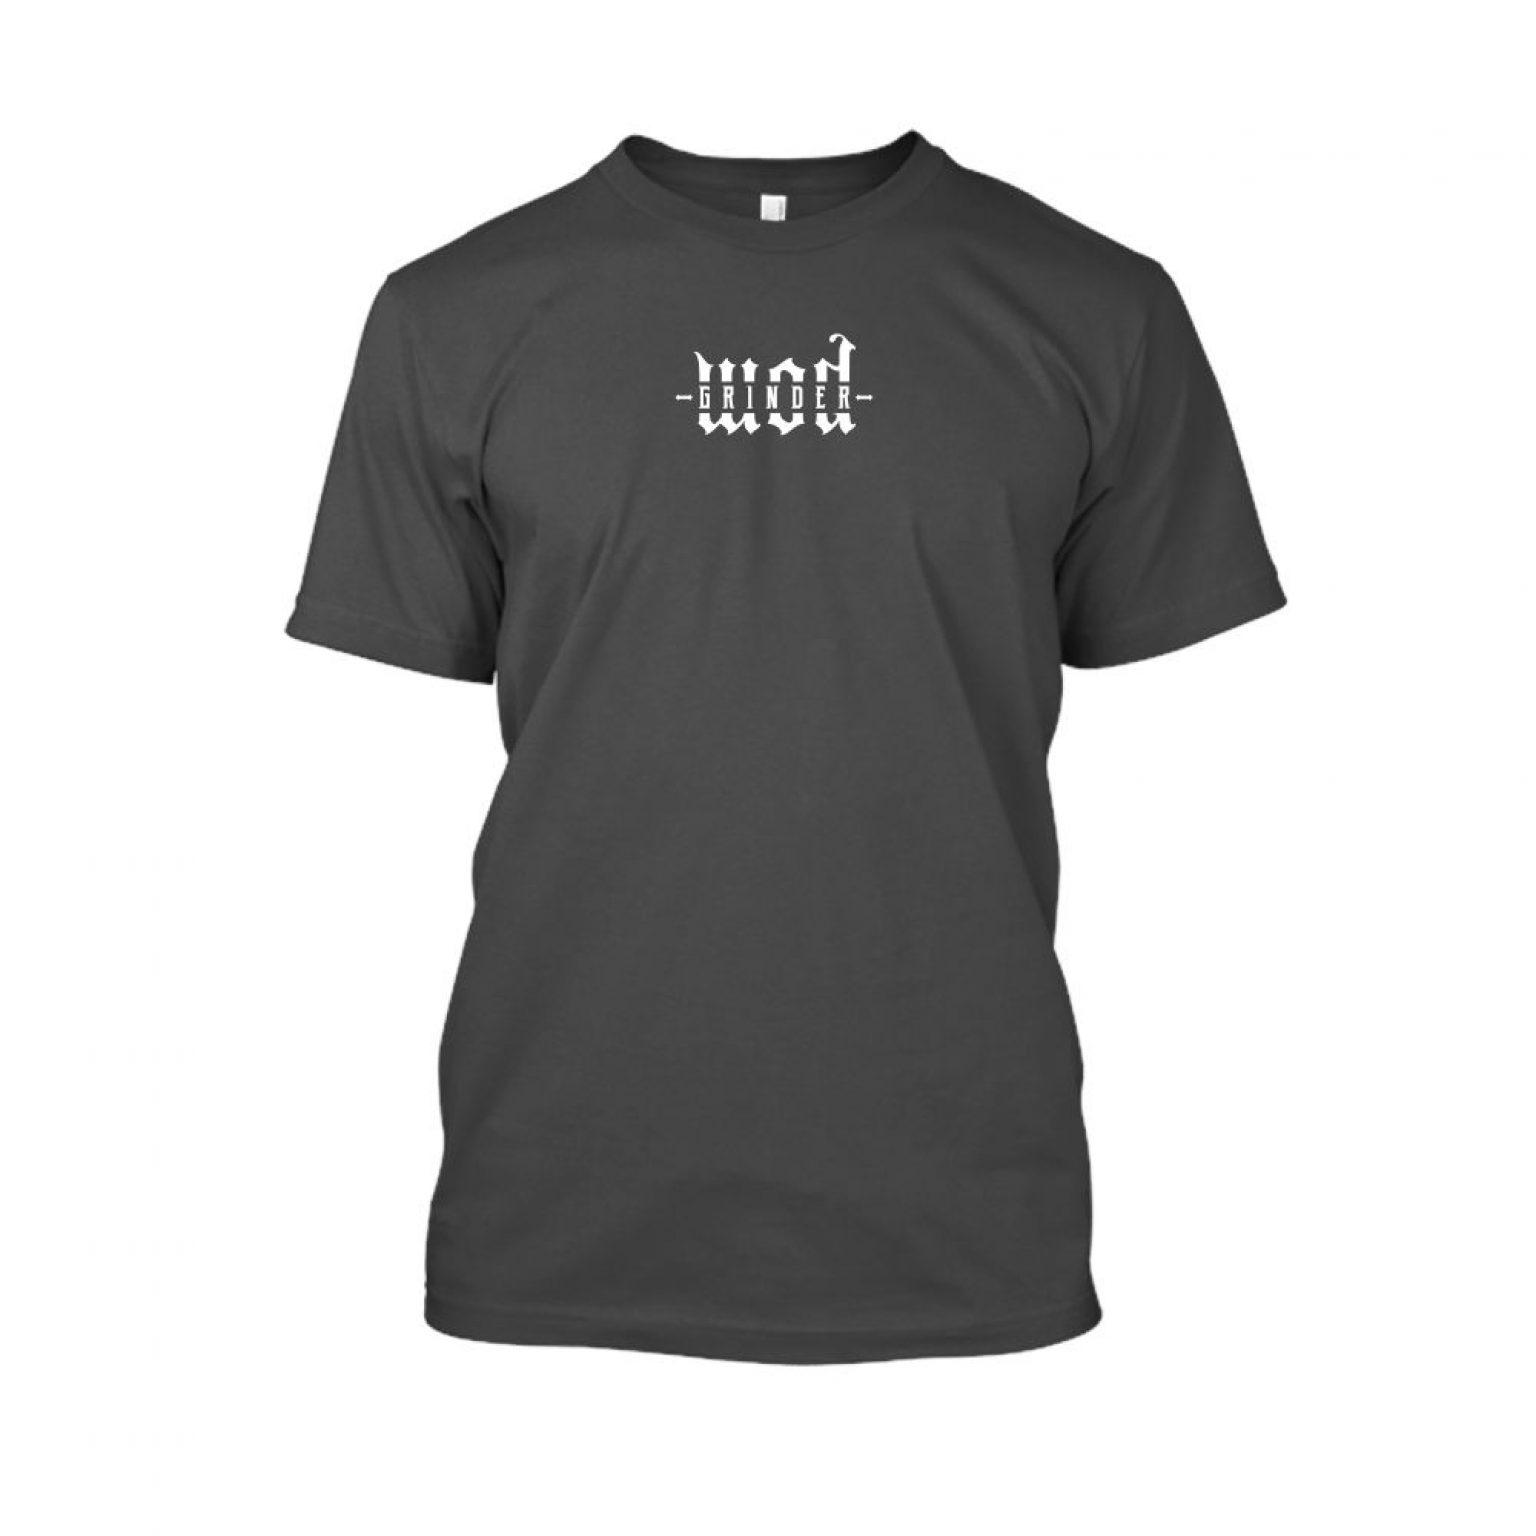 WODgrind herren shirt charcoal